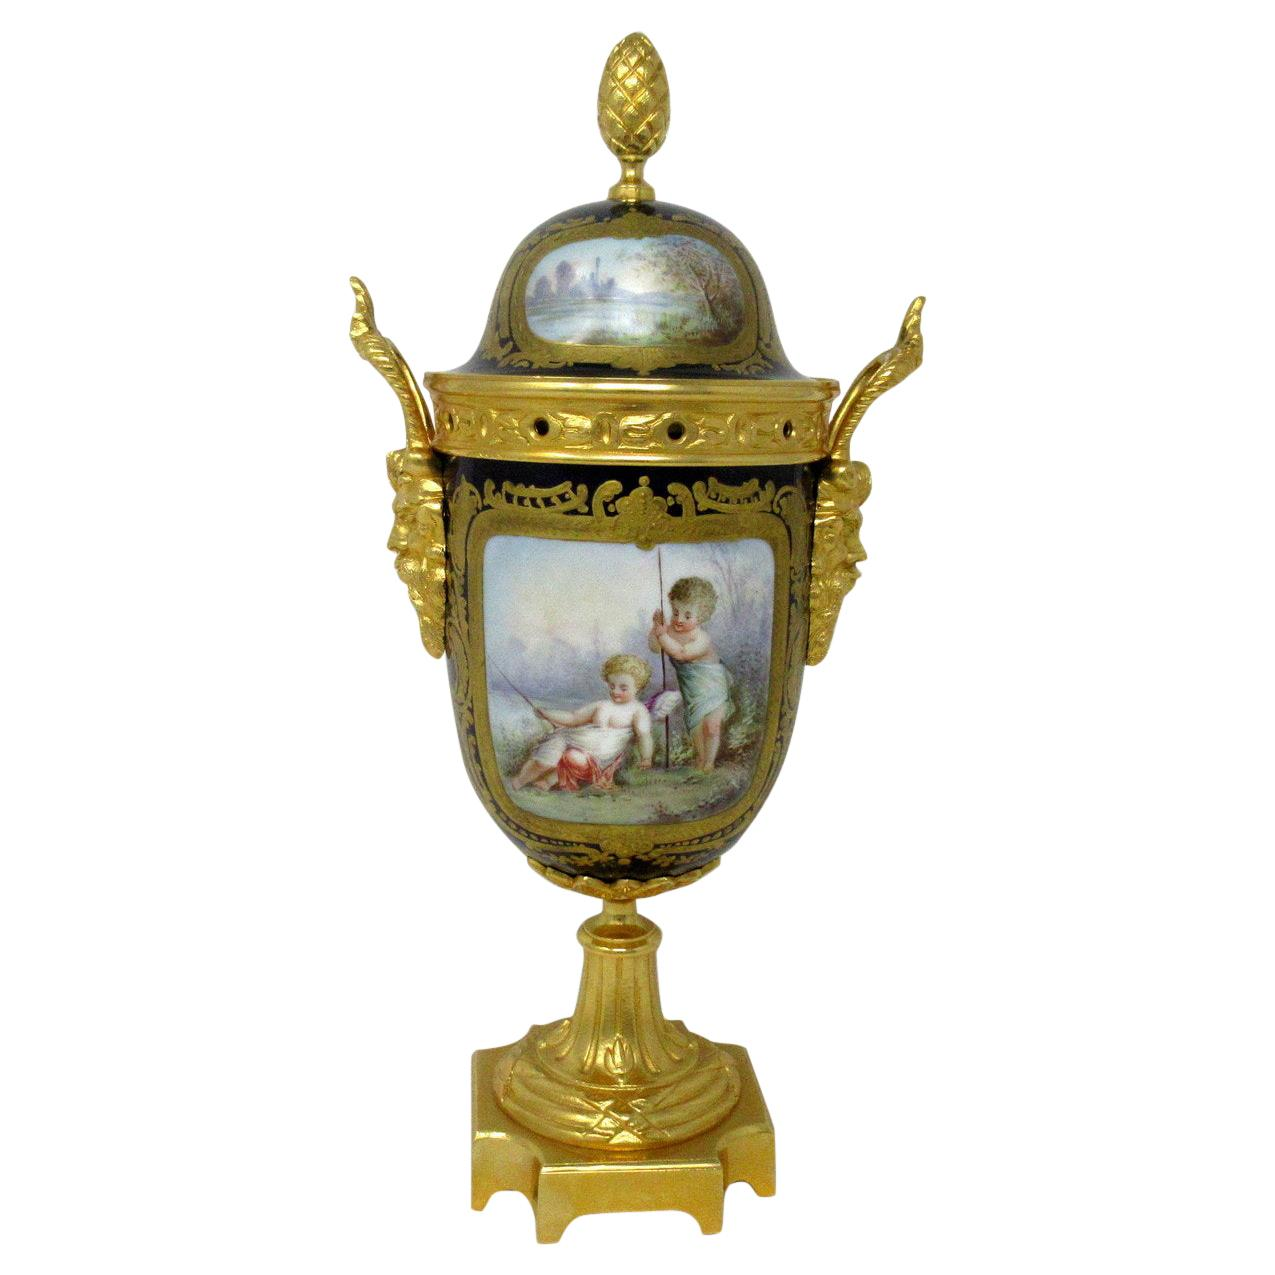 Antique French Sèvres Porcelain Ormolu Gilt Bronze Urn Vase Potpourri Cobalt